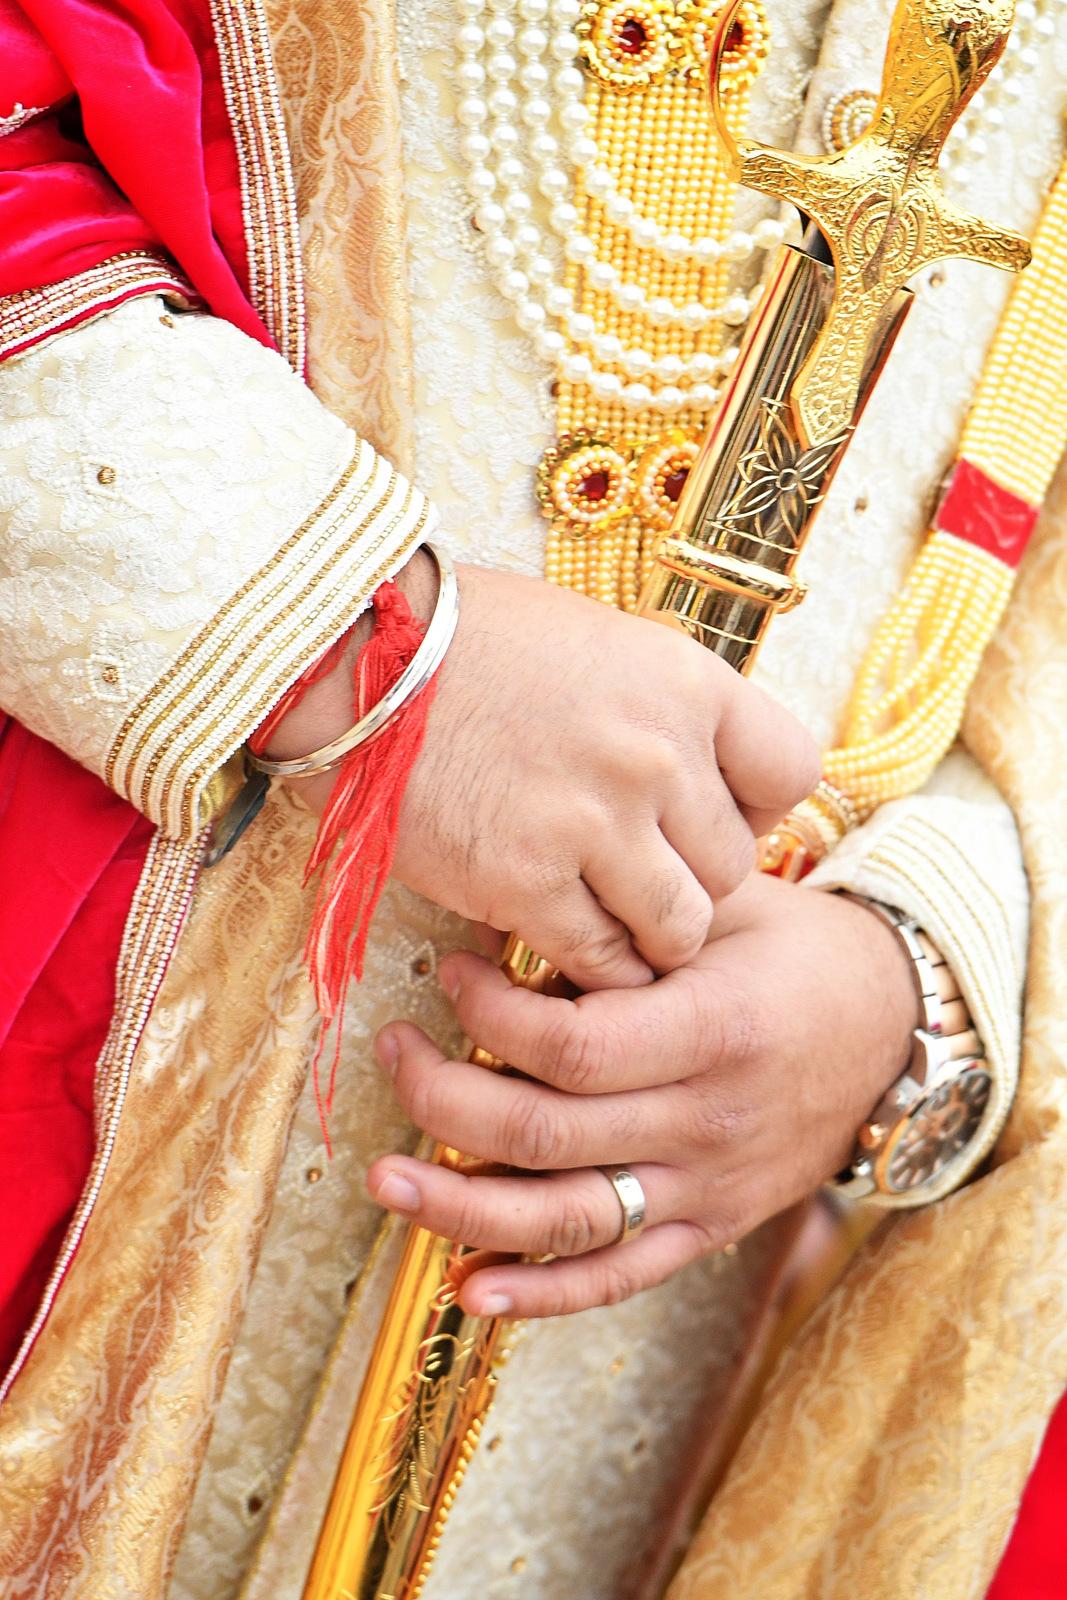 houston-weddings-manjot-karanjit-04.jpg